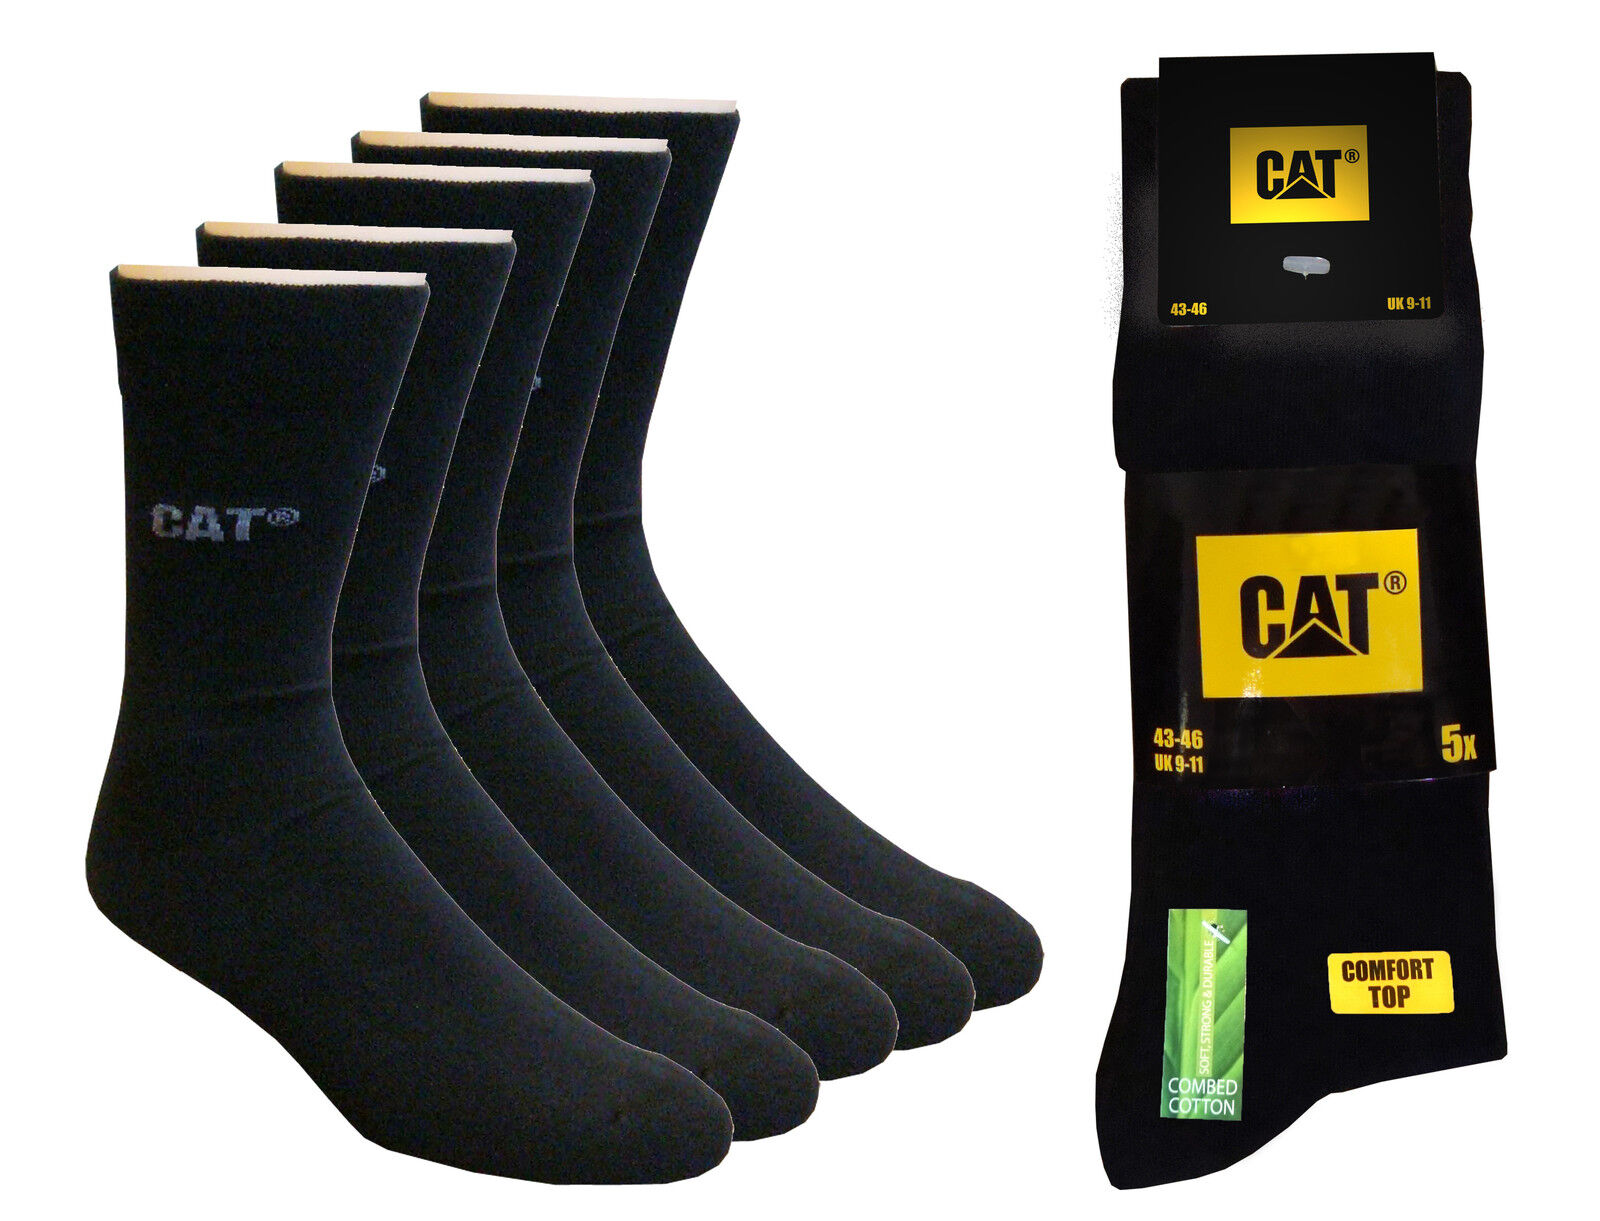 CAT Caterpillar 10 Paar Businesssocken, SONDERANGEBOT, Schwarz, 39-42,